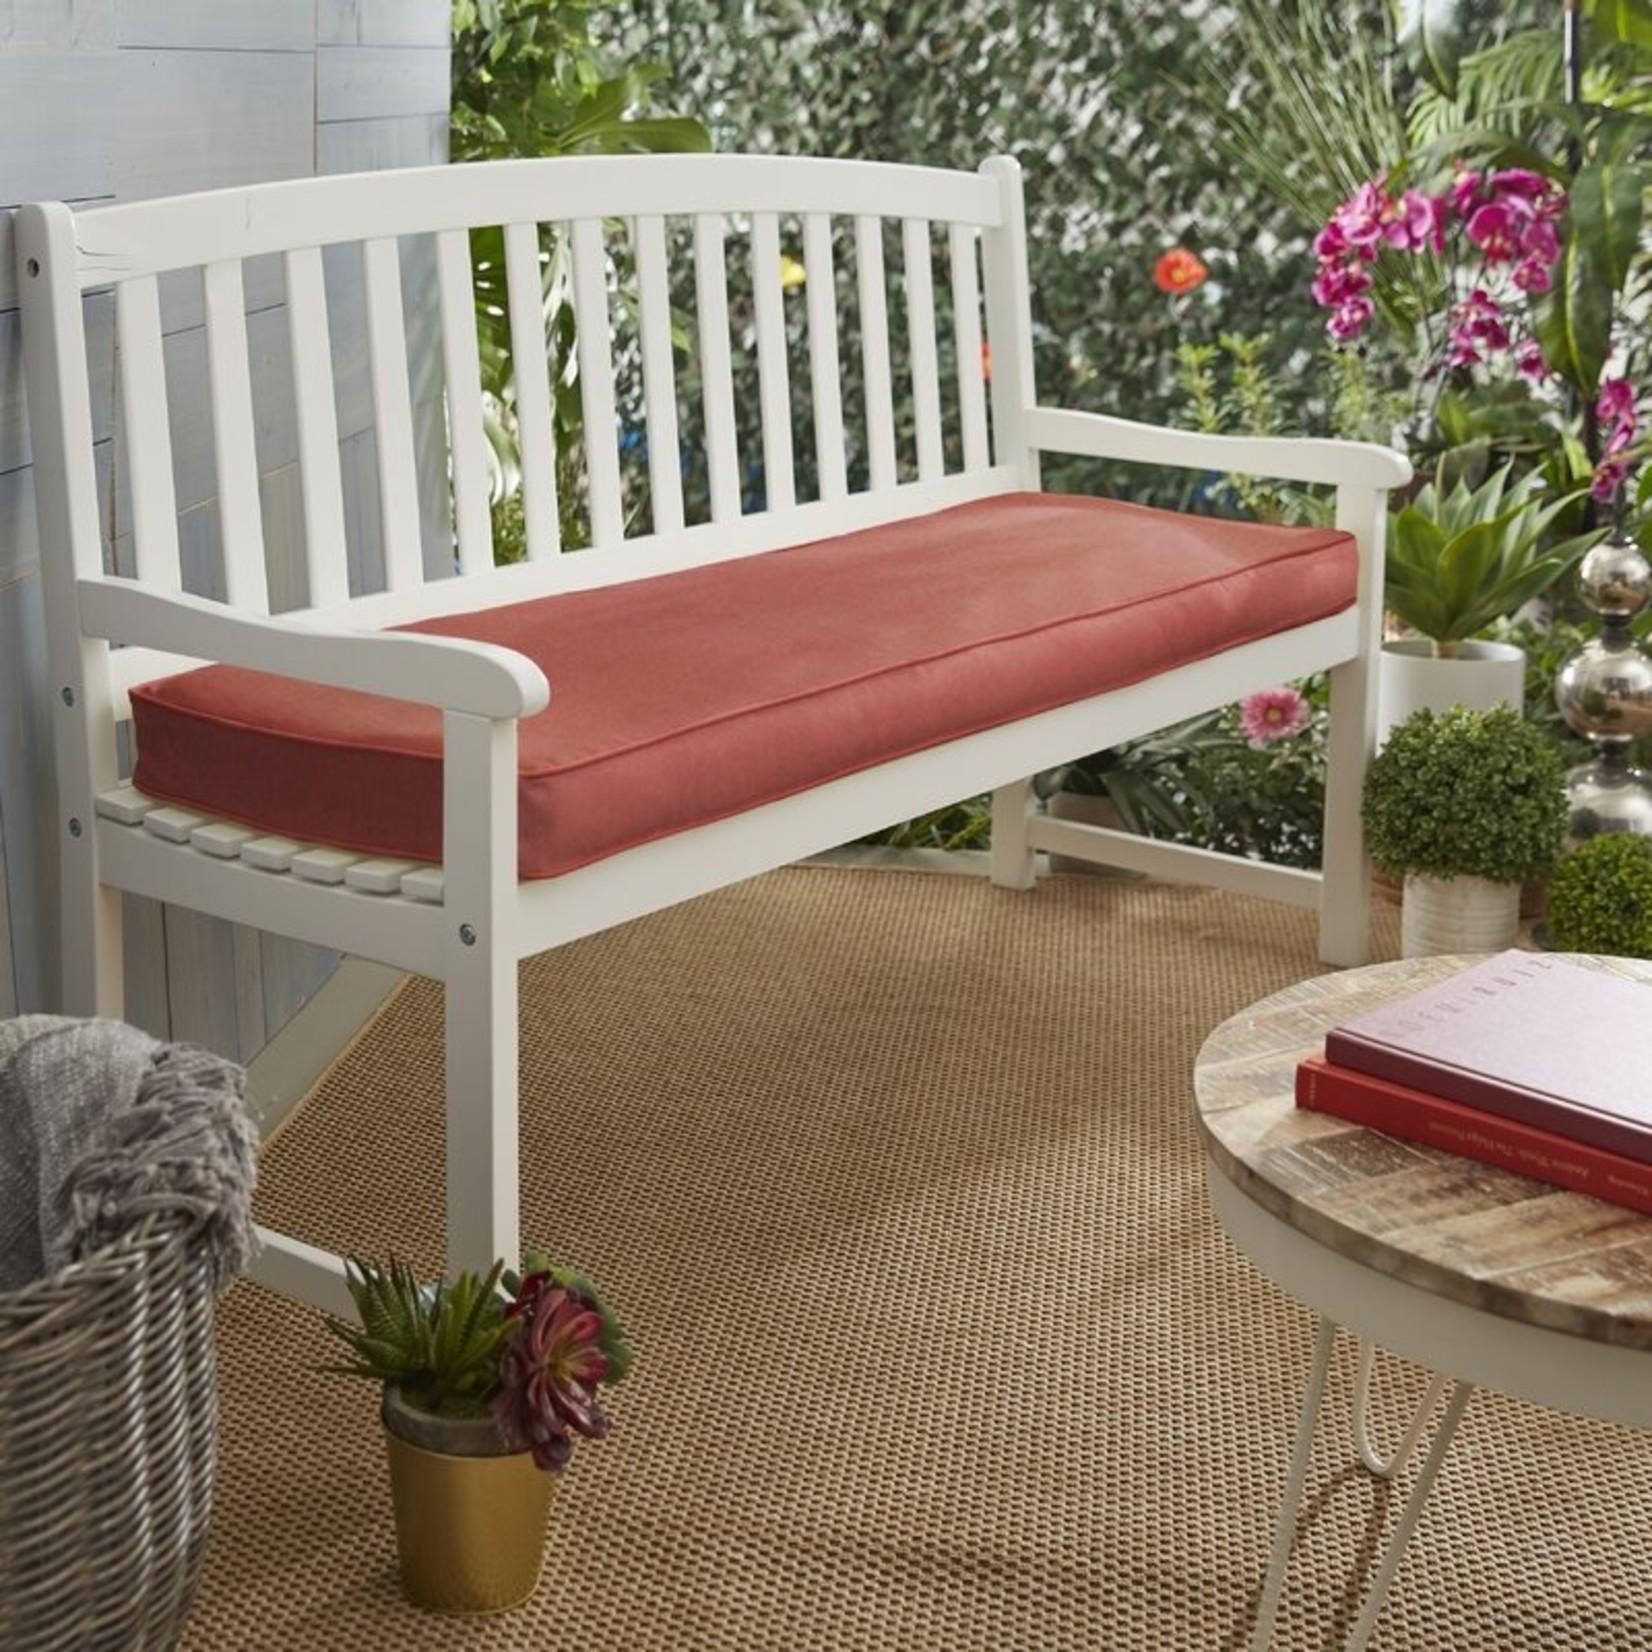 *Outdoor Sunbrella Bench Seat Cushion - Canvas Henna